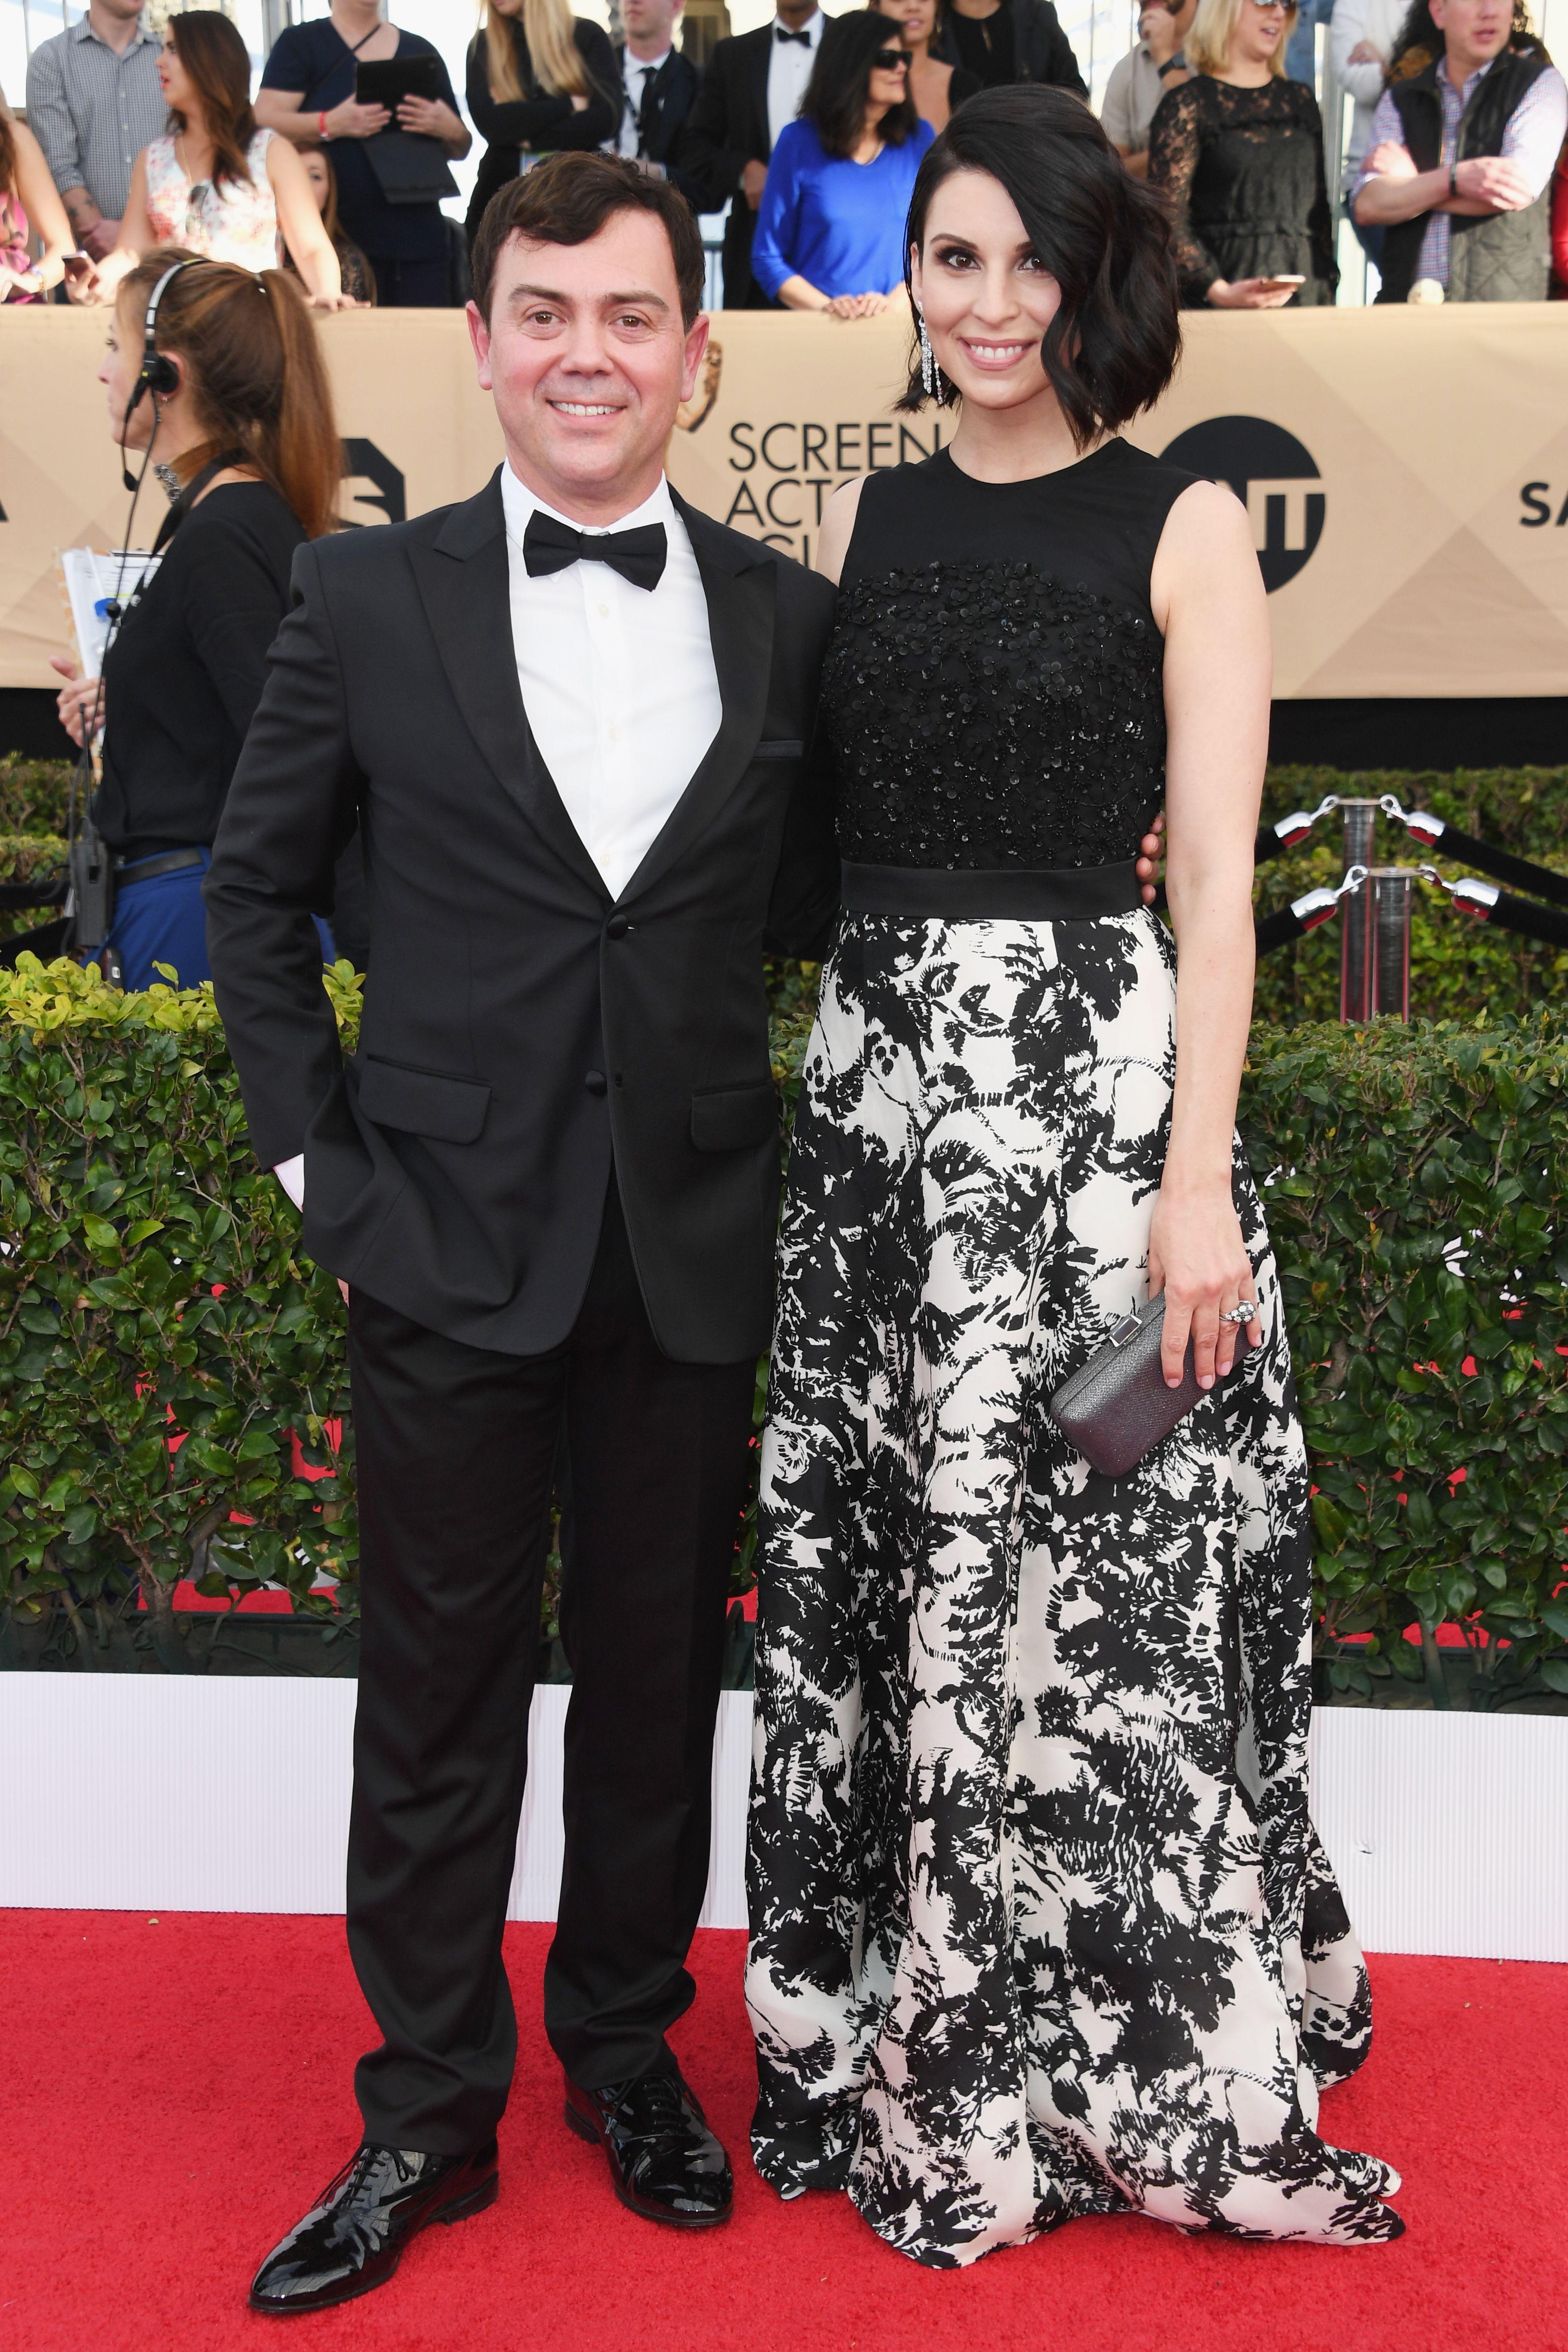 Joe Lo Truglio Beth Dover In Escada In 2020 Sag Awards Red Carpet Couples Awards 2017